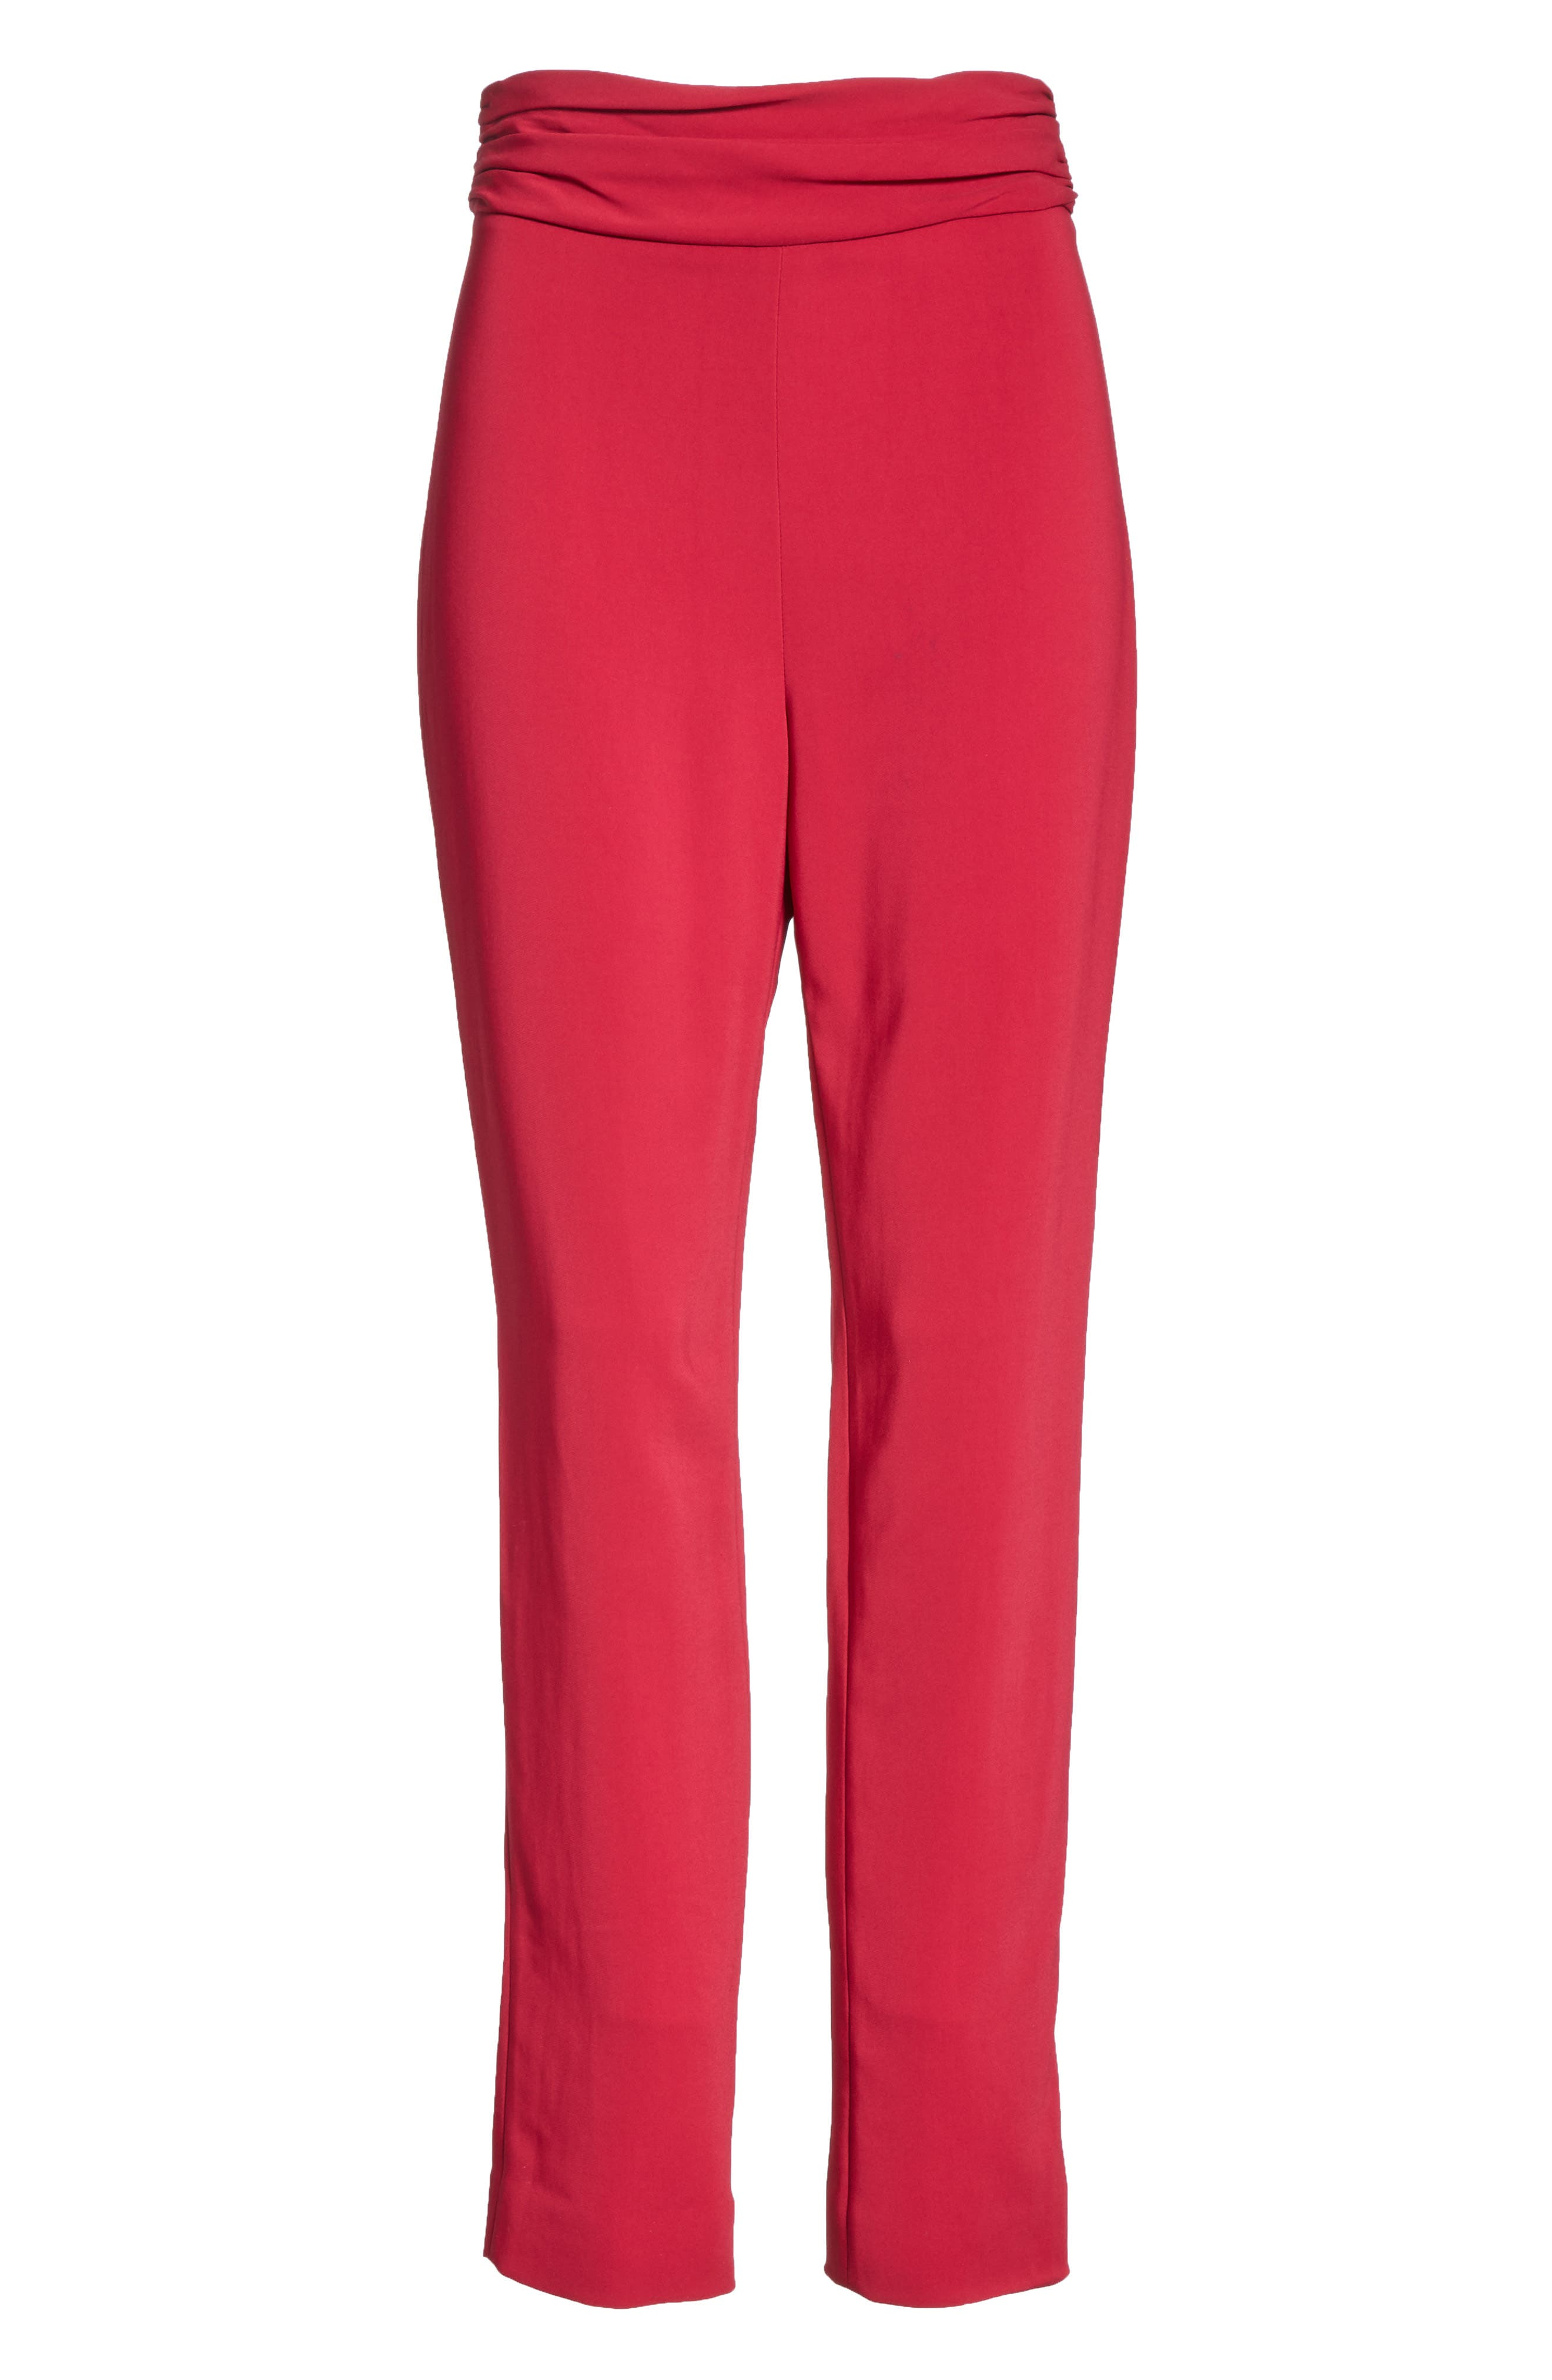 CUSHNIE, High Waist Pants, Alternate thumbnail 6, color, CAMELLIA